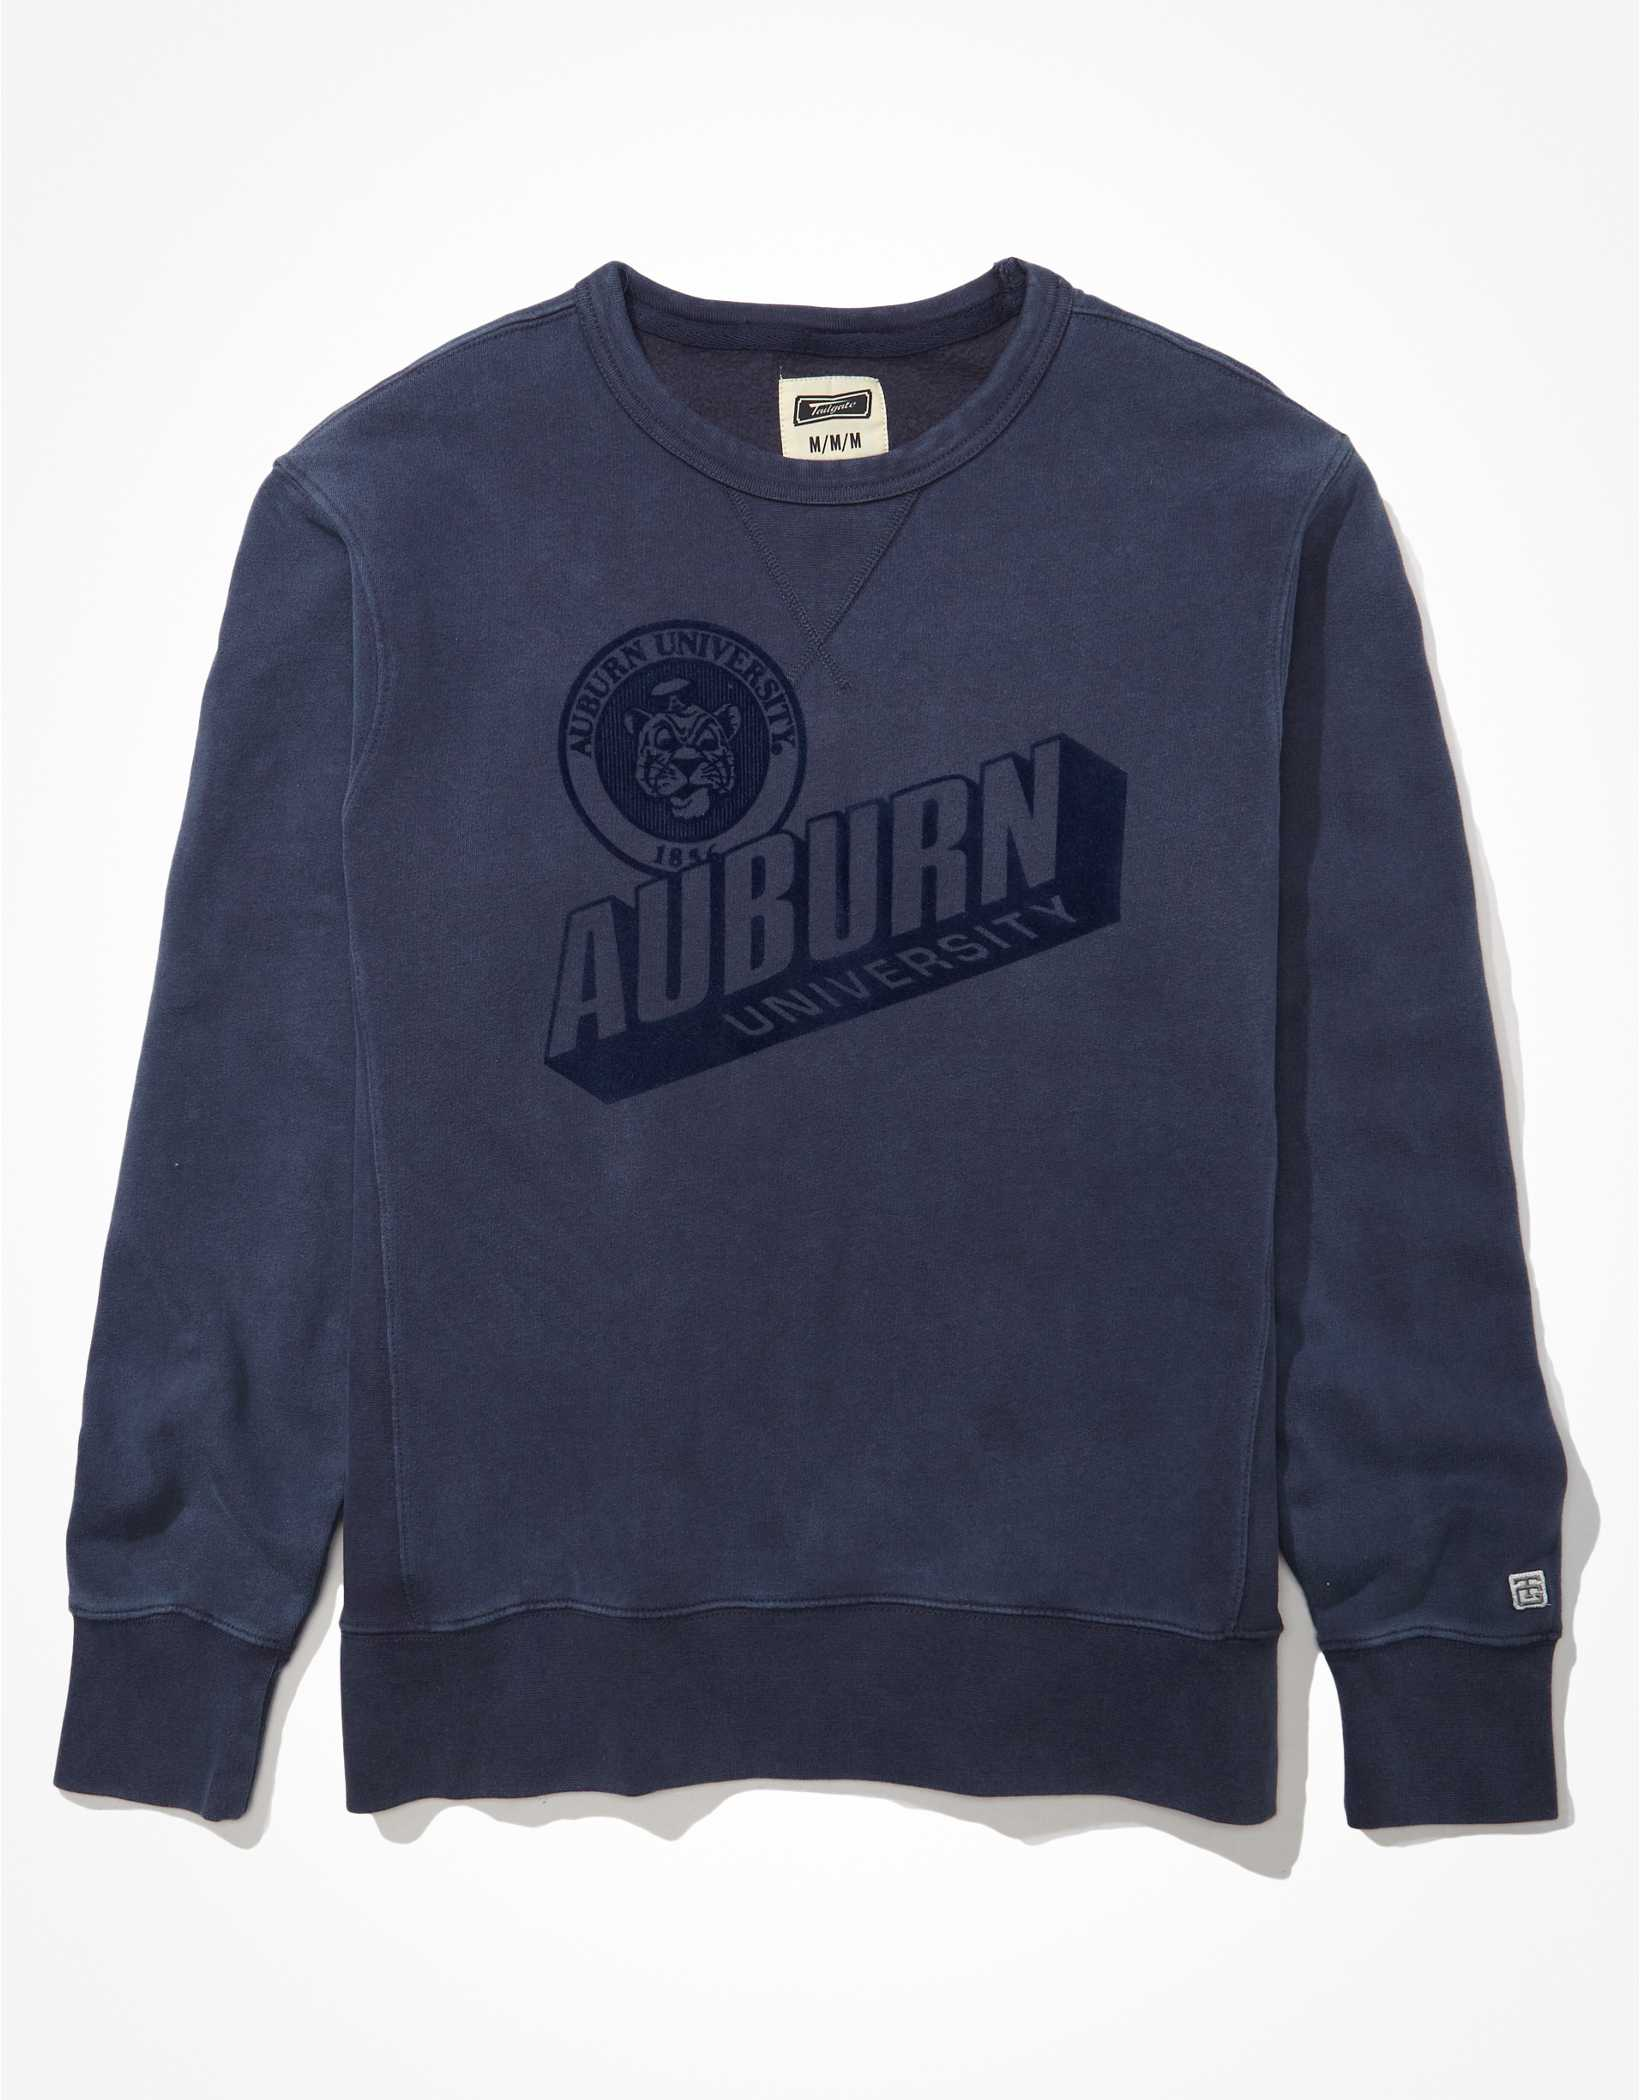 Tailgate Men's Auburn Tigers Tonal Fleece Crew Neck Sweatshirt